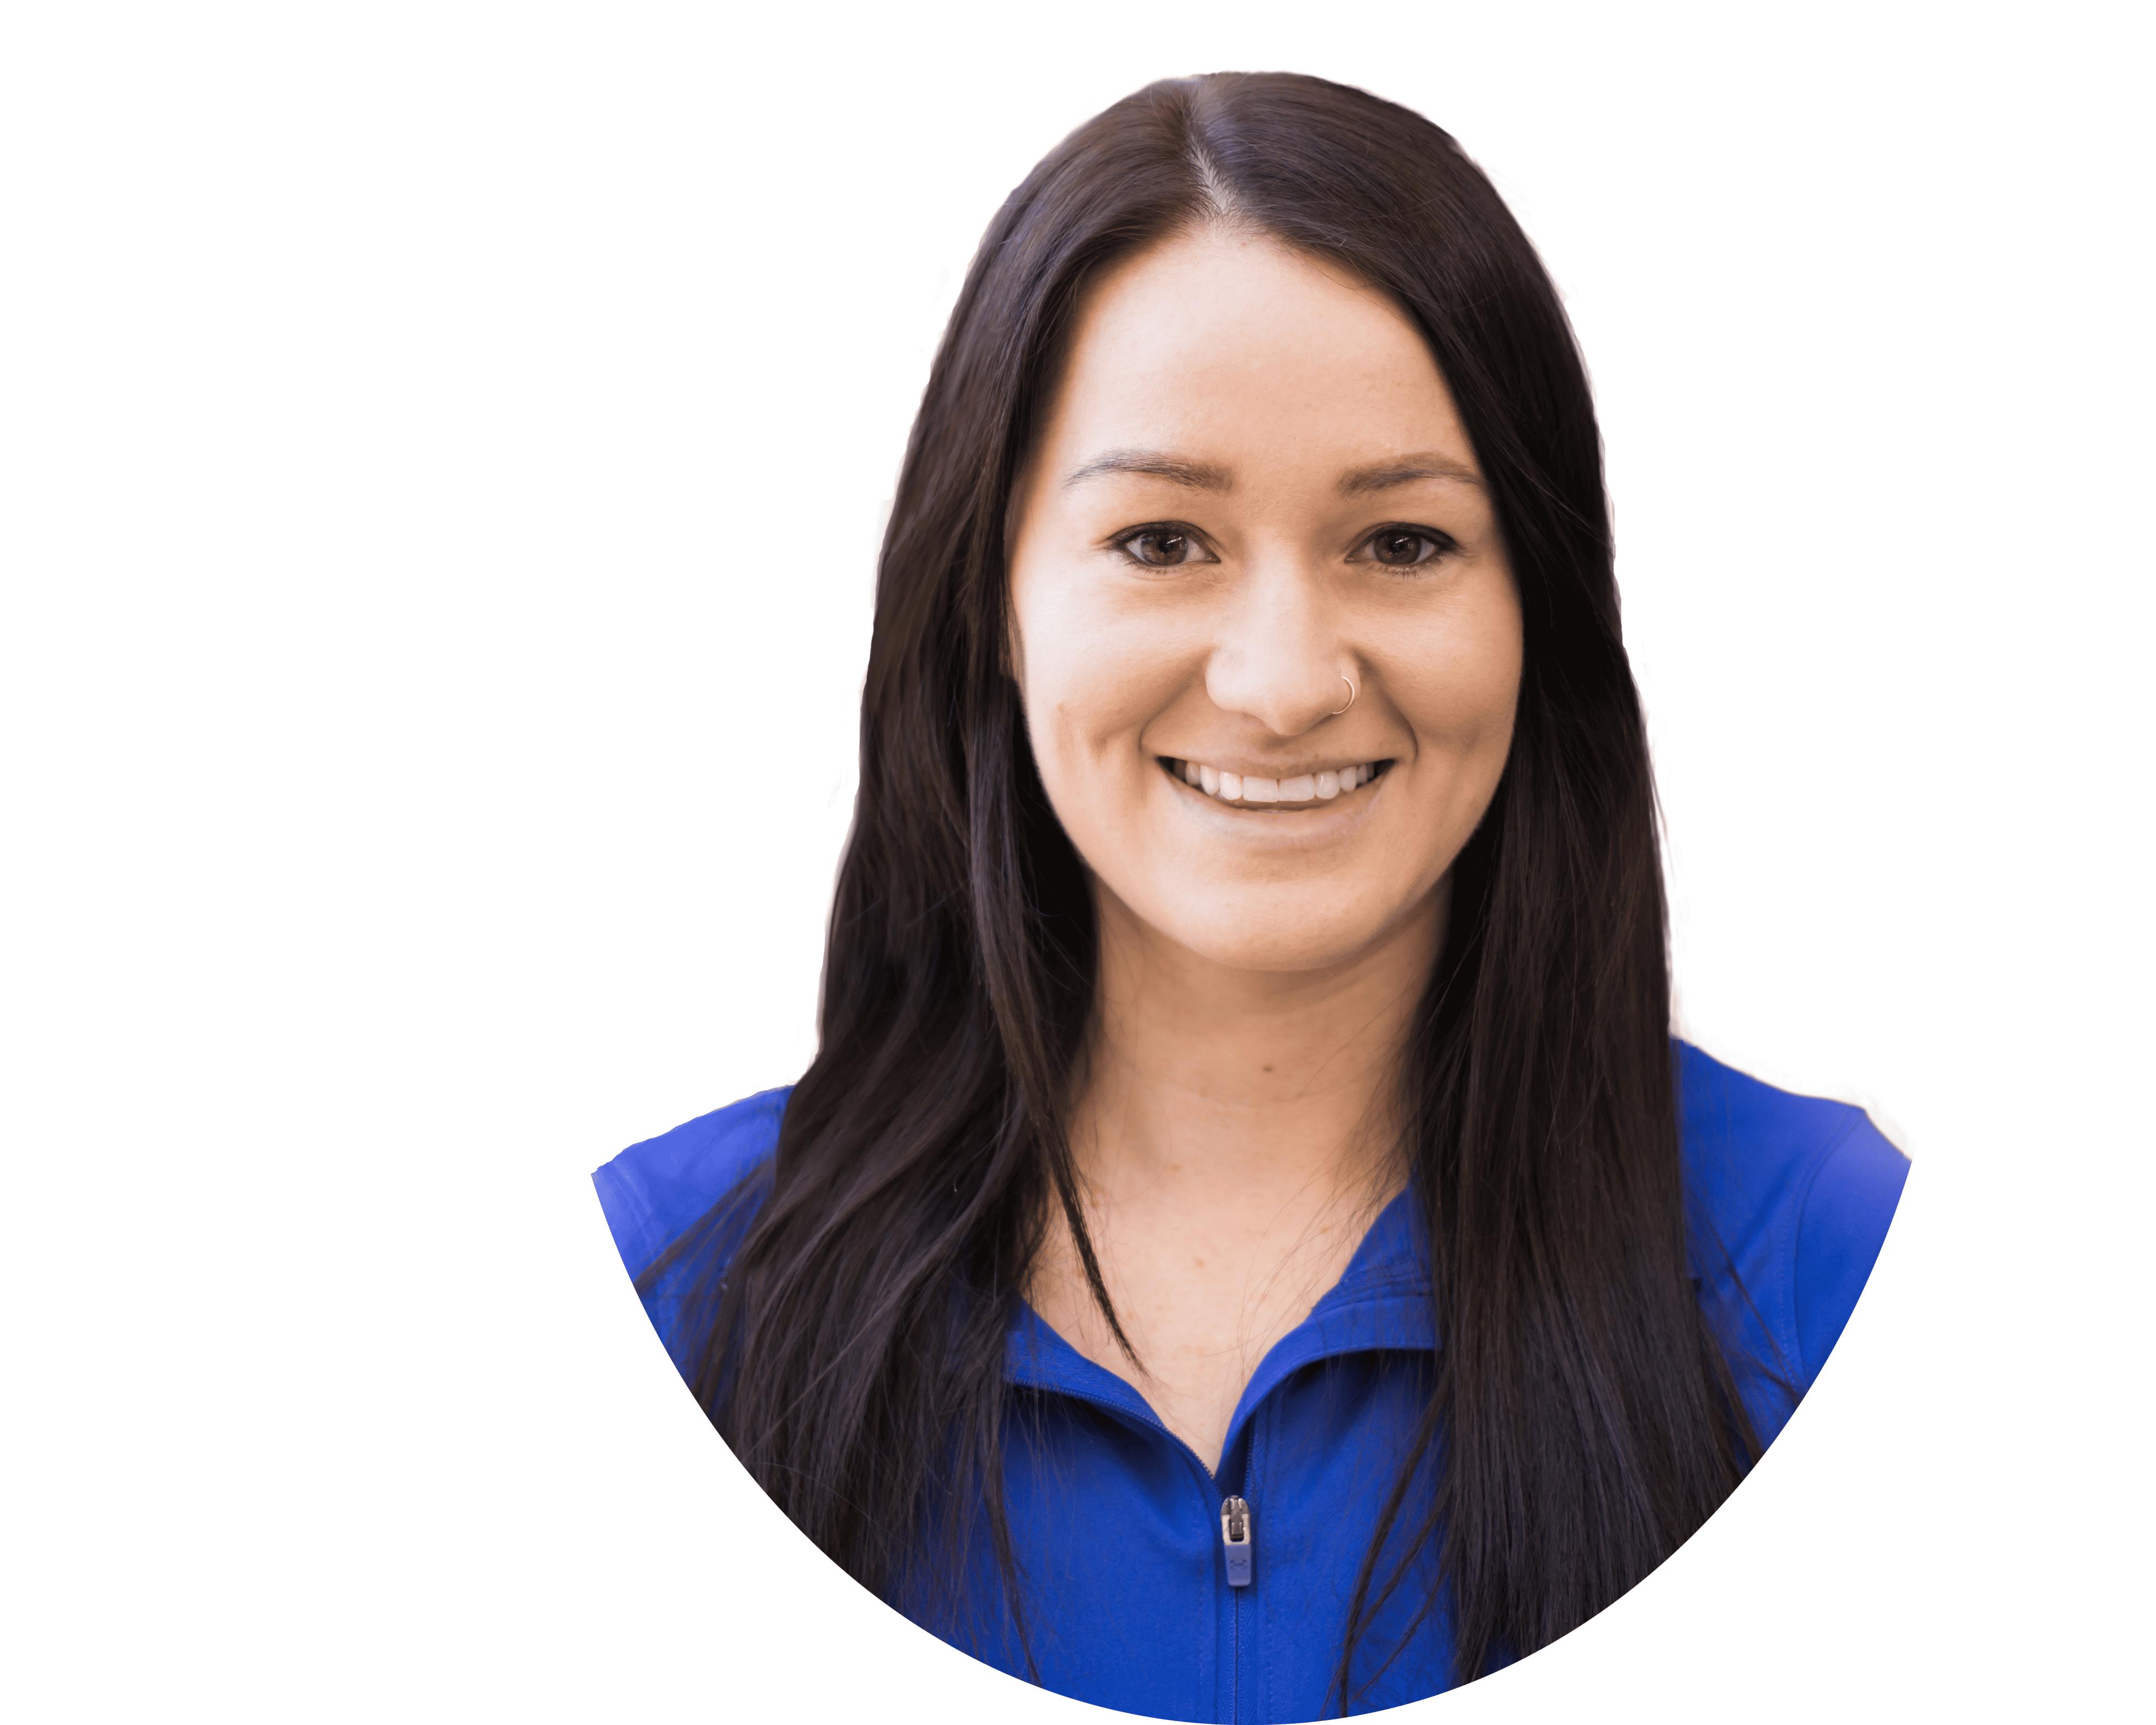 Dr. Kirsten Gilmour